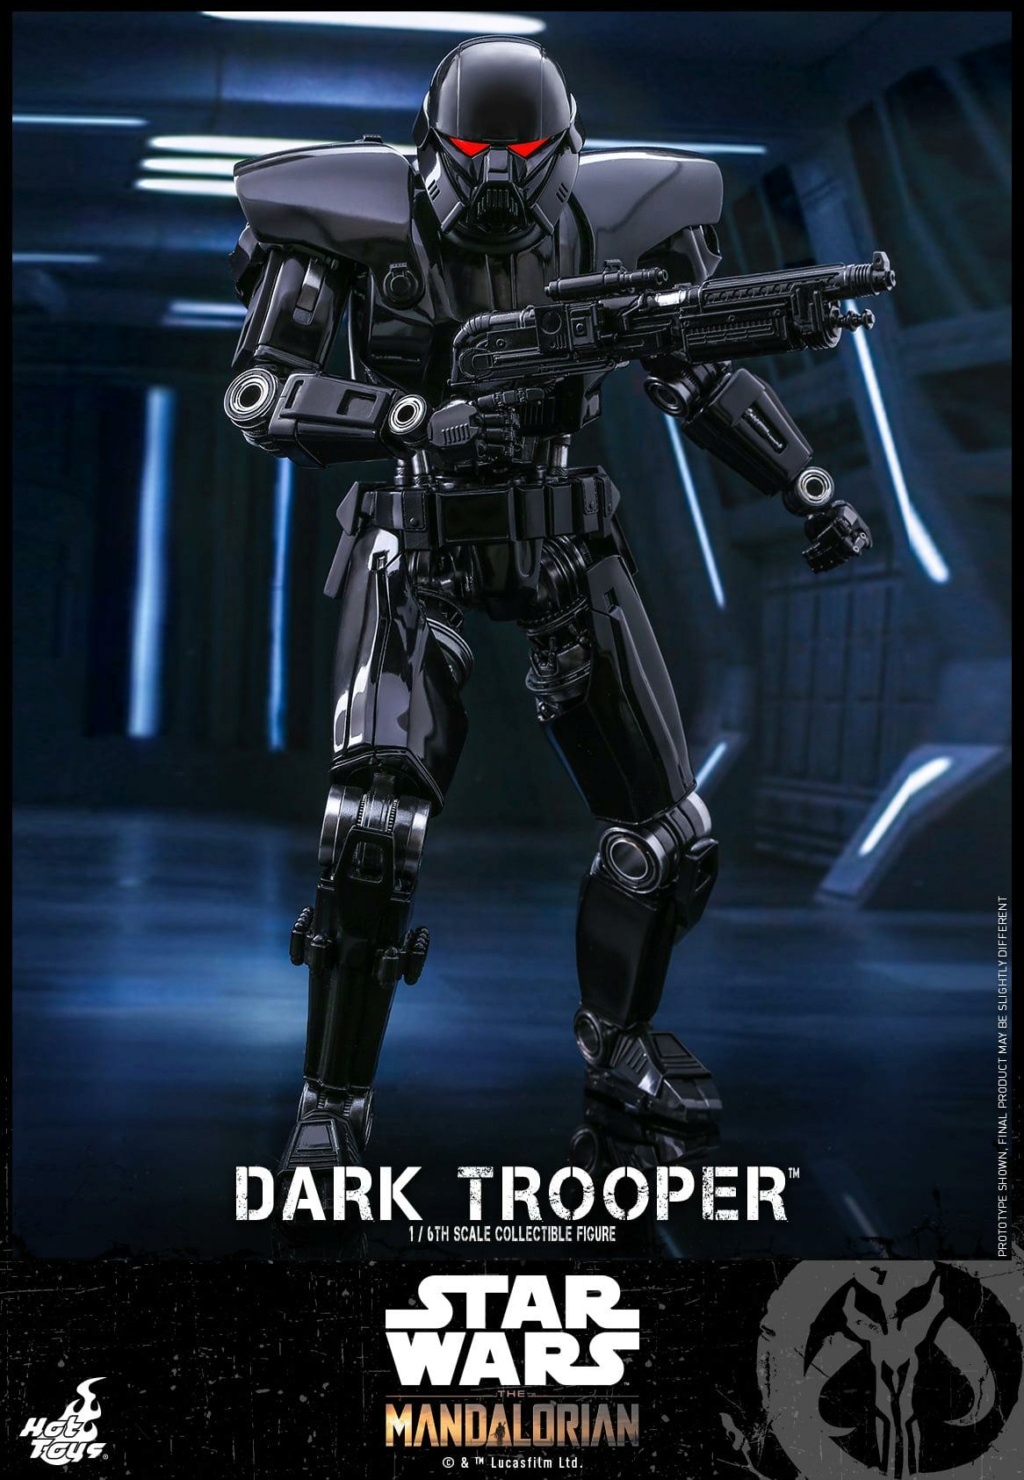 Dark Trooper Collectible Figure - 1/6th scale - Hot Toys Dark_t13